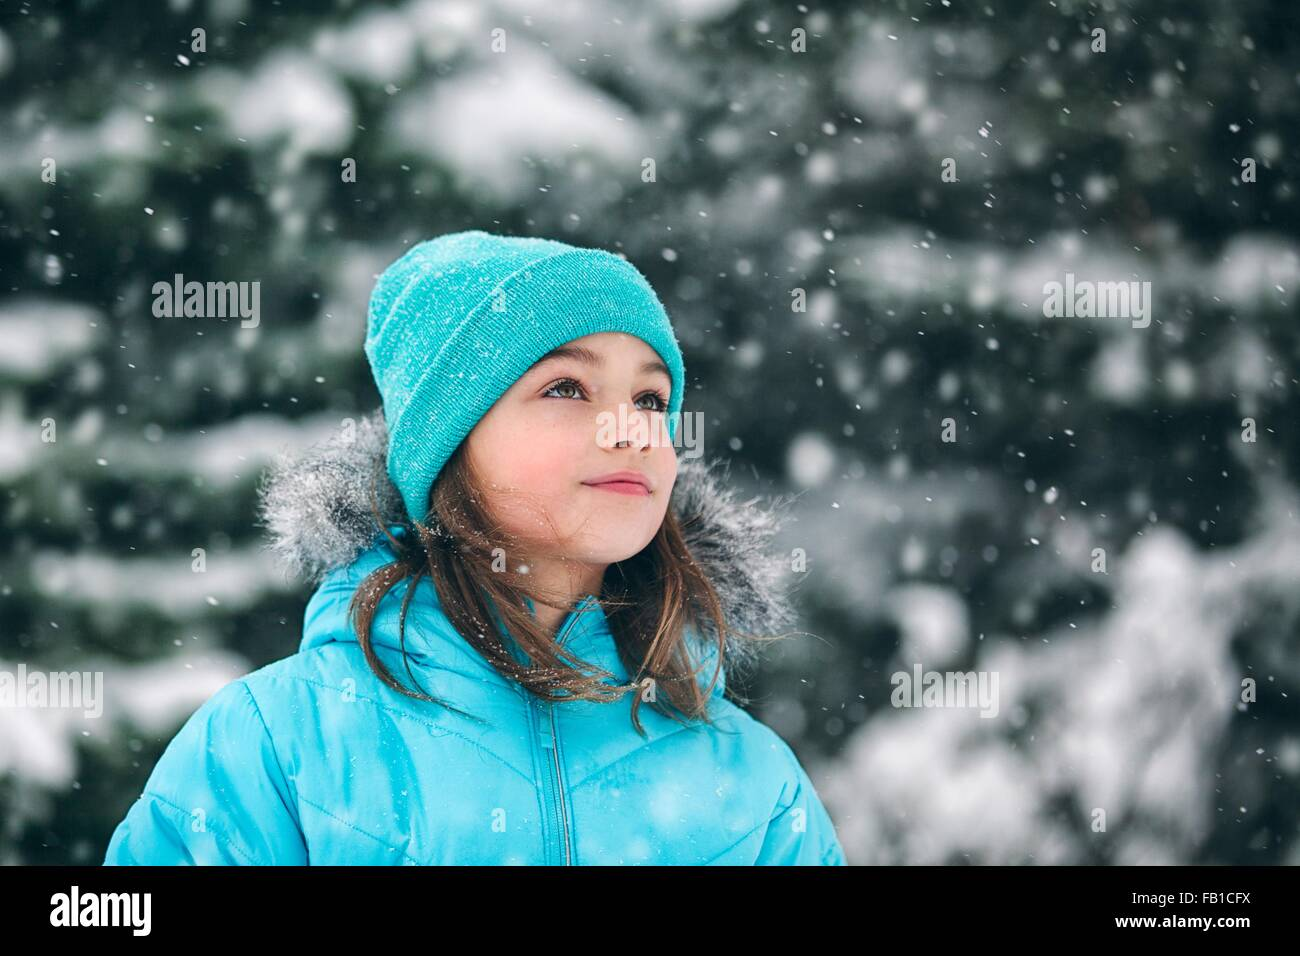 Girl wearing knit hat looking away, snowing - Stock Image